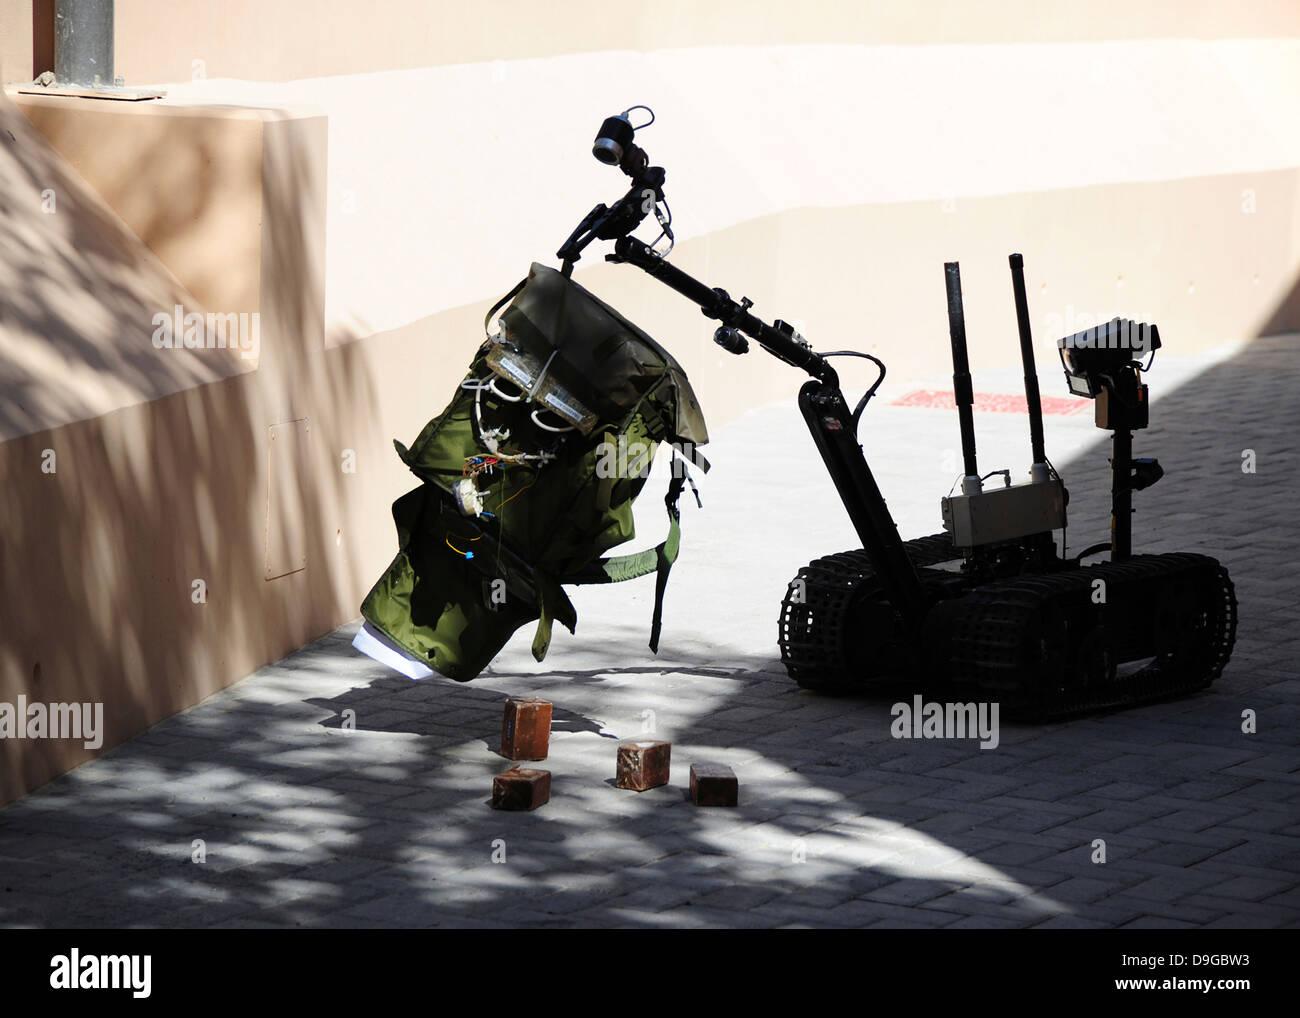 Talon remote-controlled robot investigates an improvised explosive device. - Stock Image